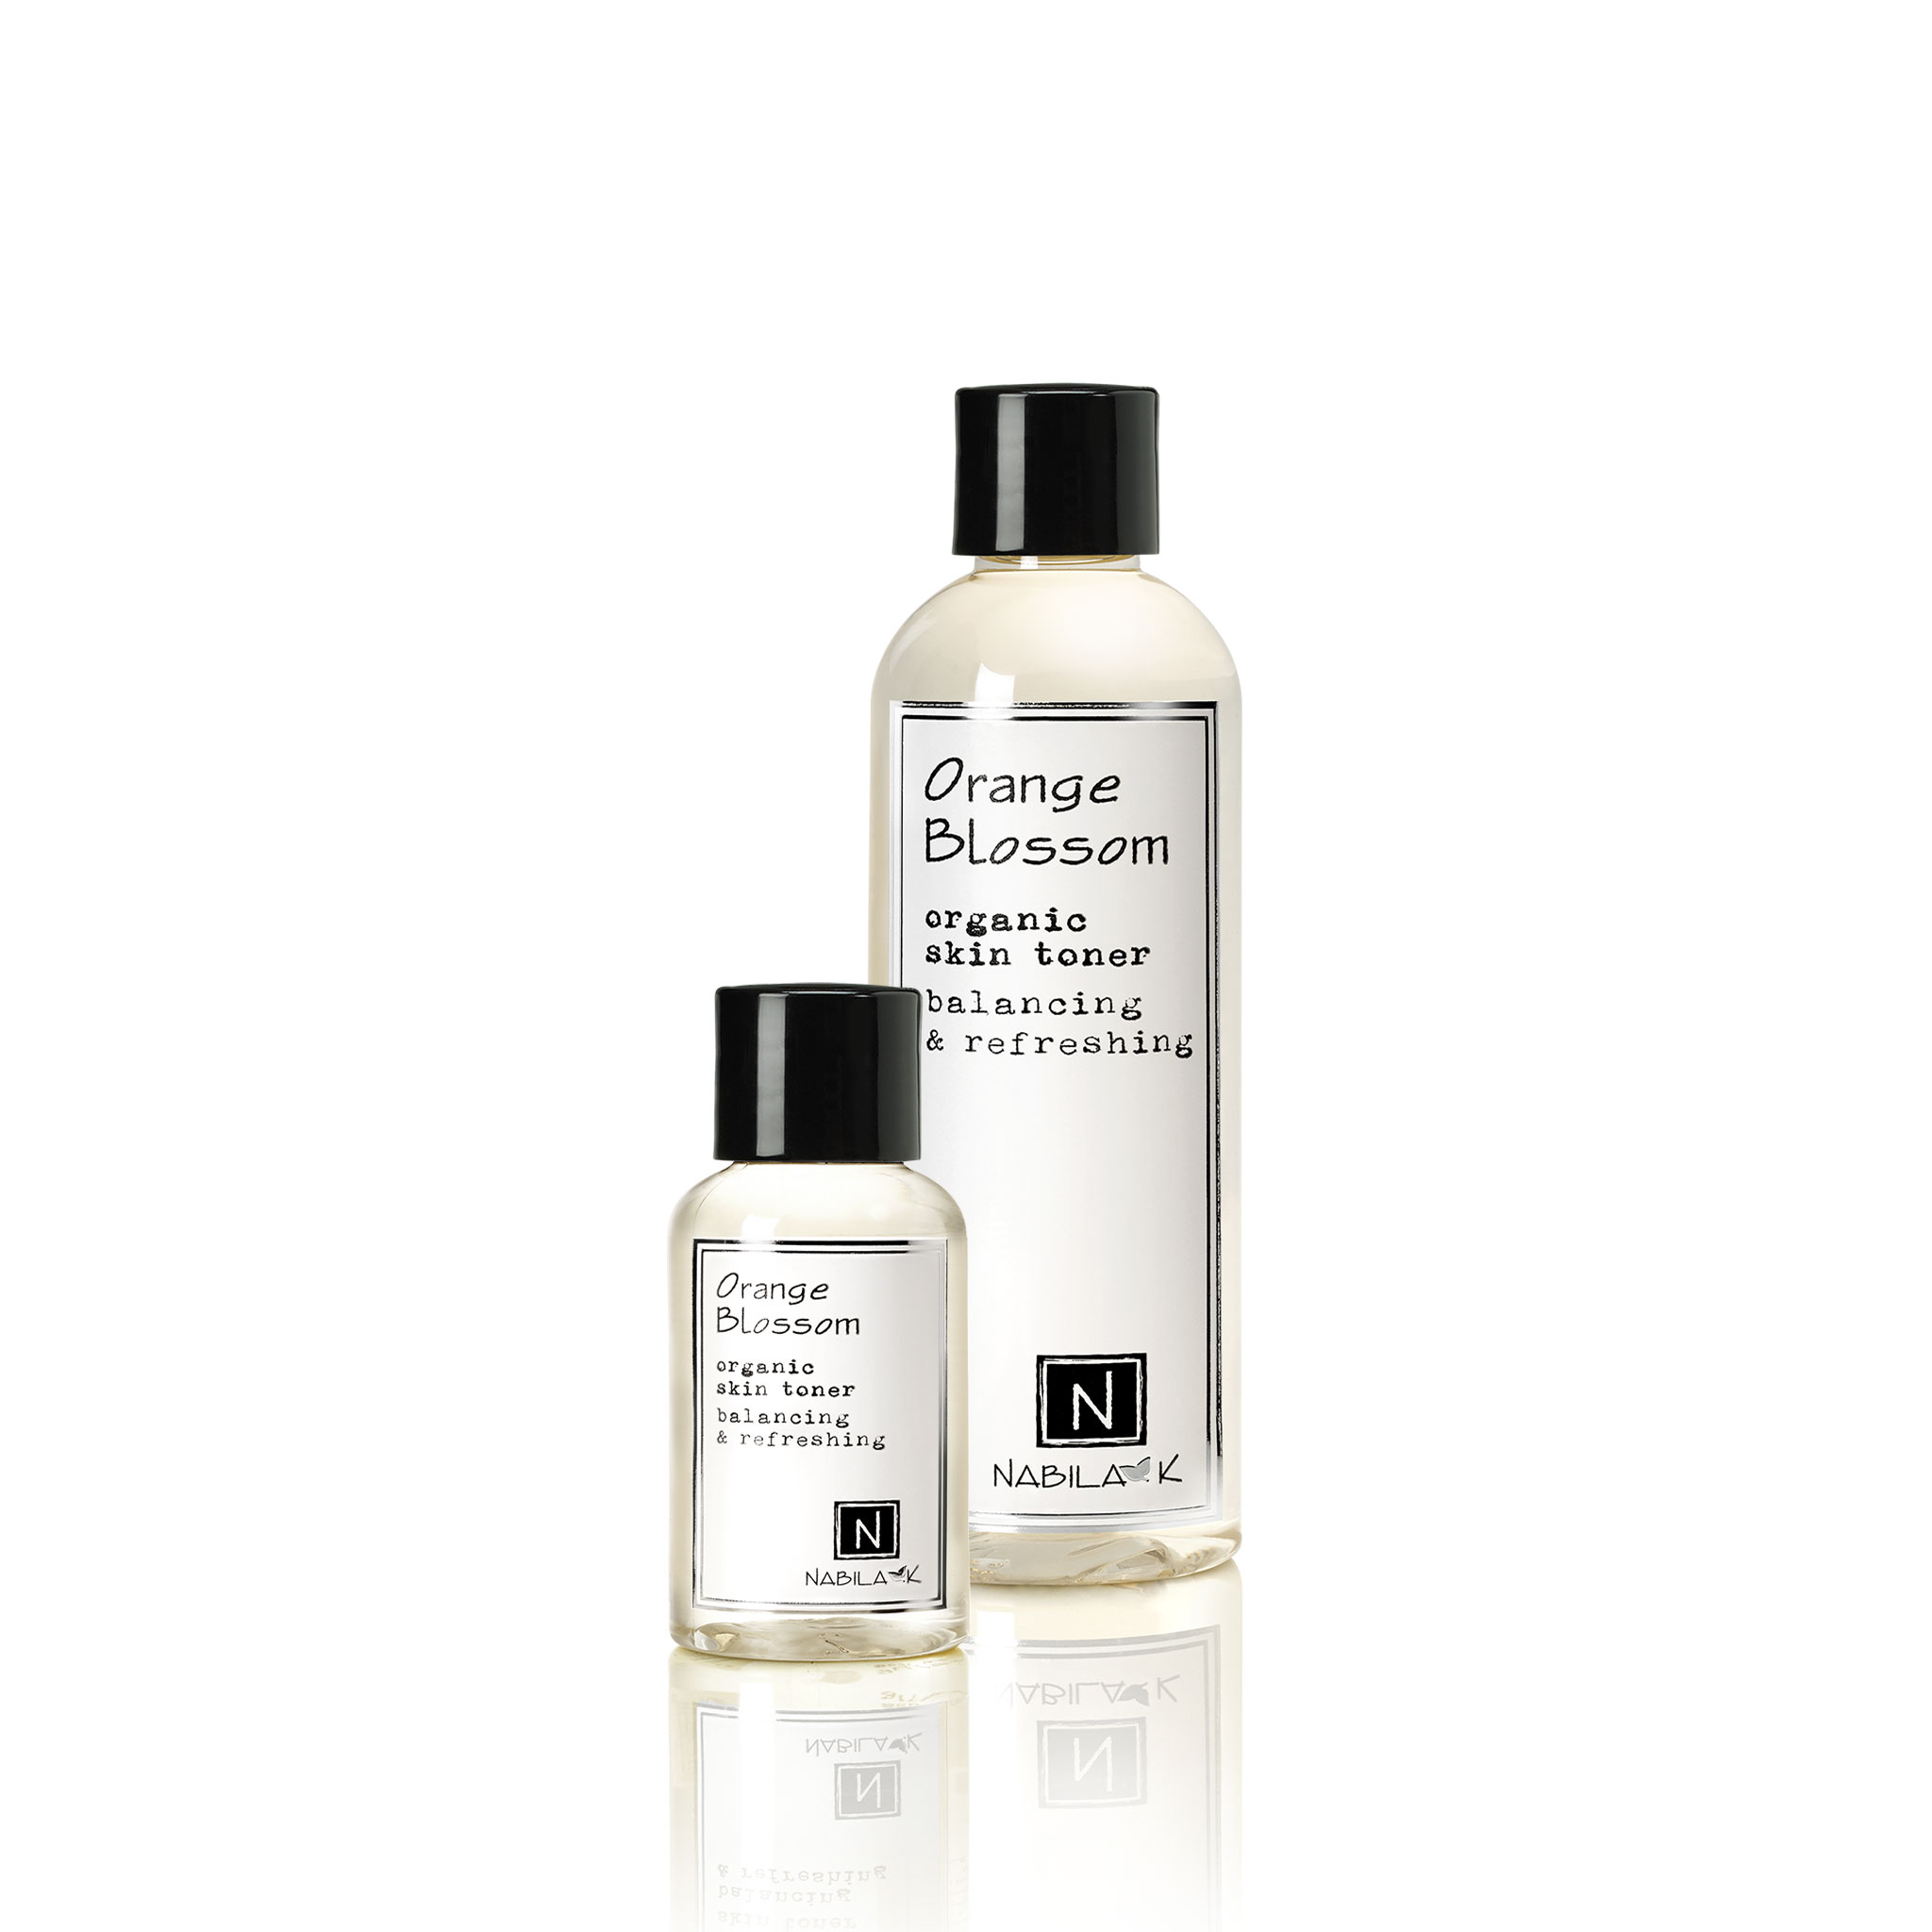 2.4oz and 9oz Orange Blossom Organic Skin Toner Balancing and Refreshing